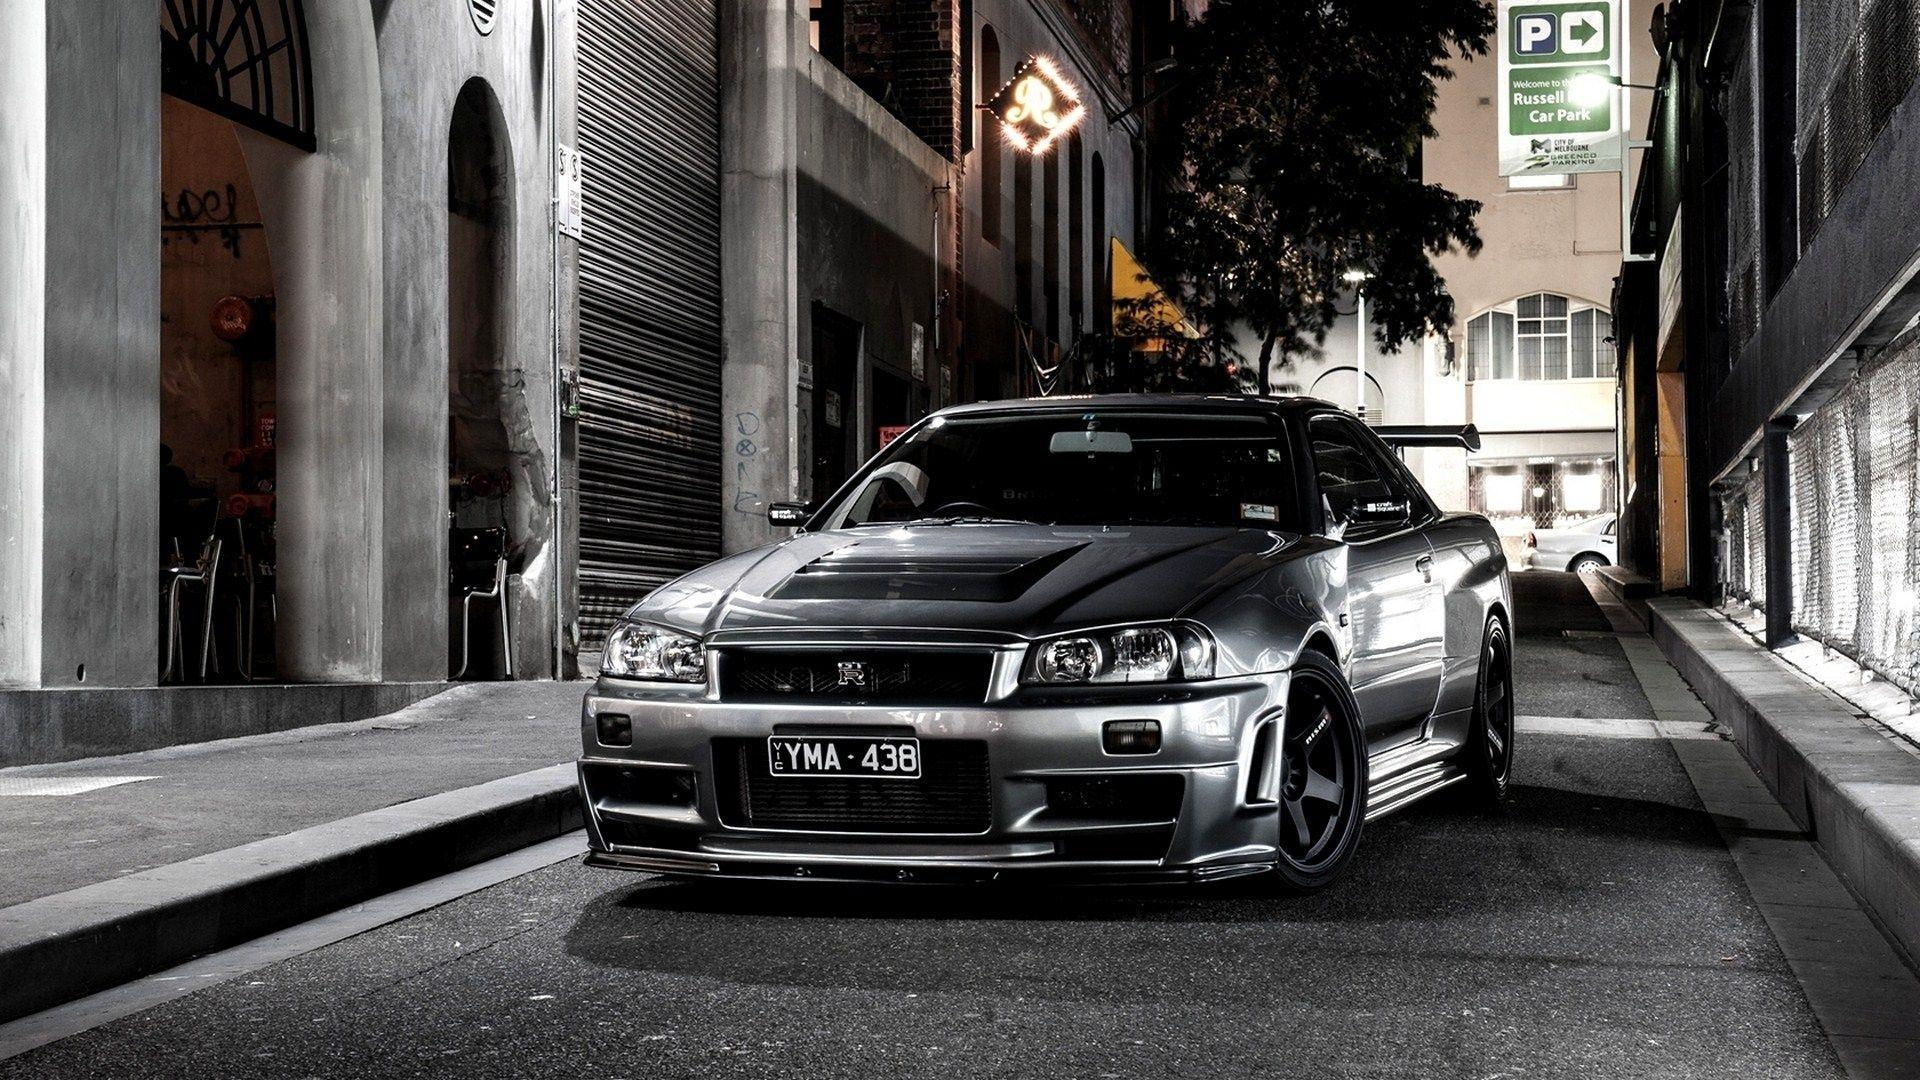 Wallpapers Nissan Skyline Group (85+)